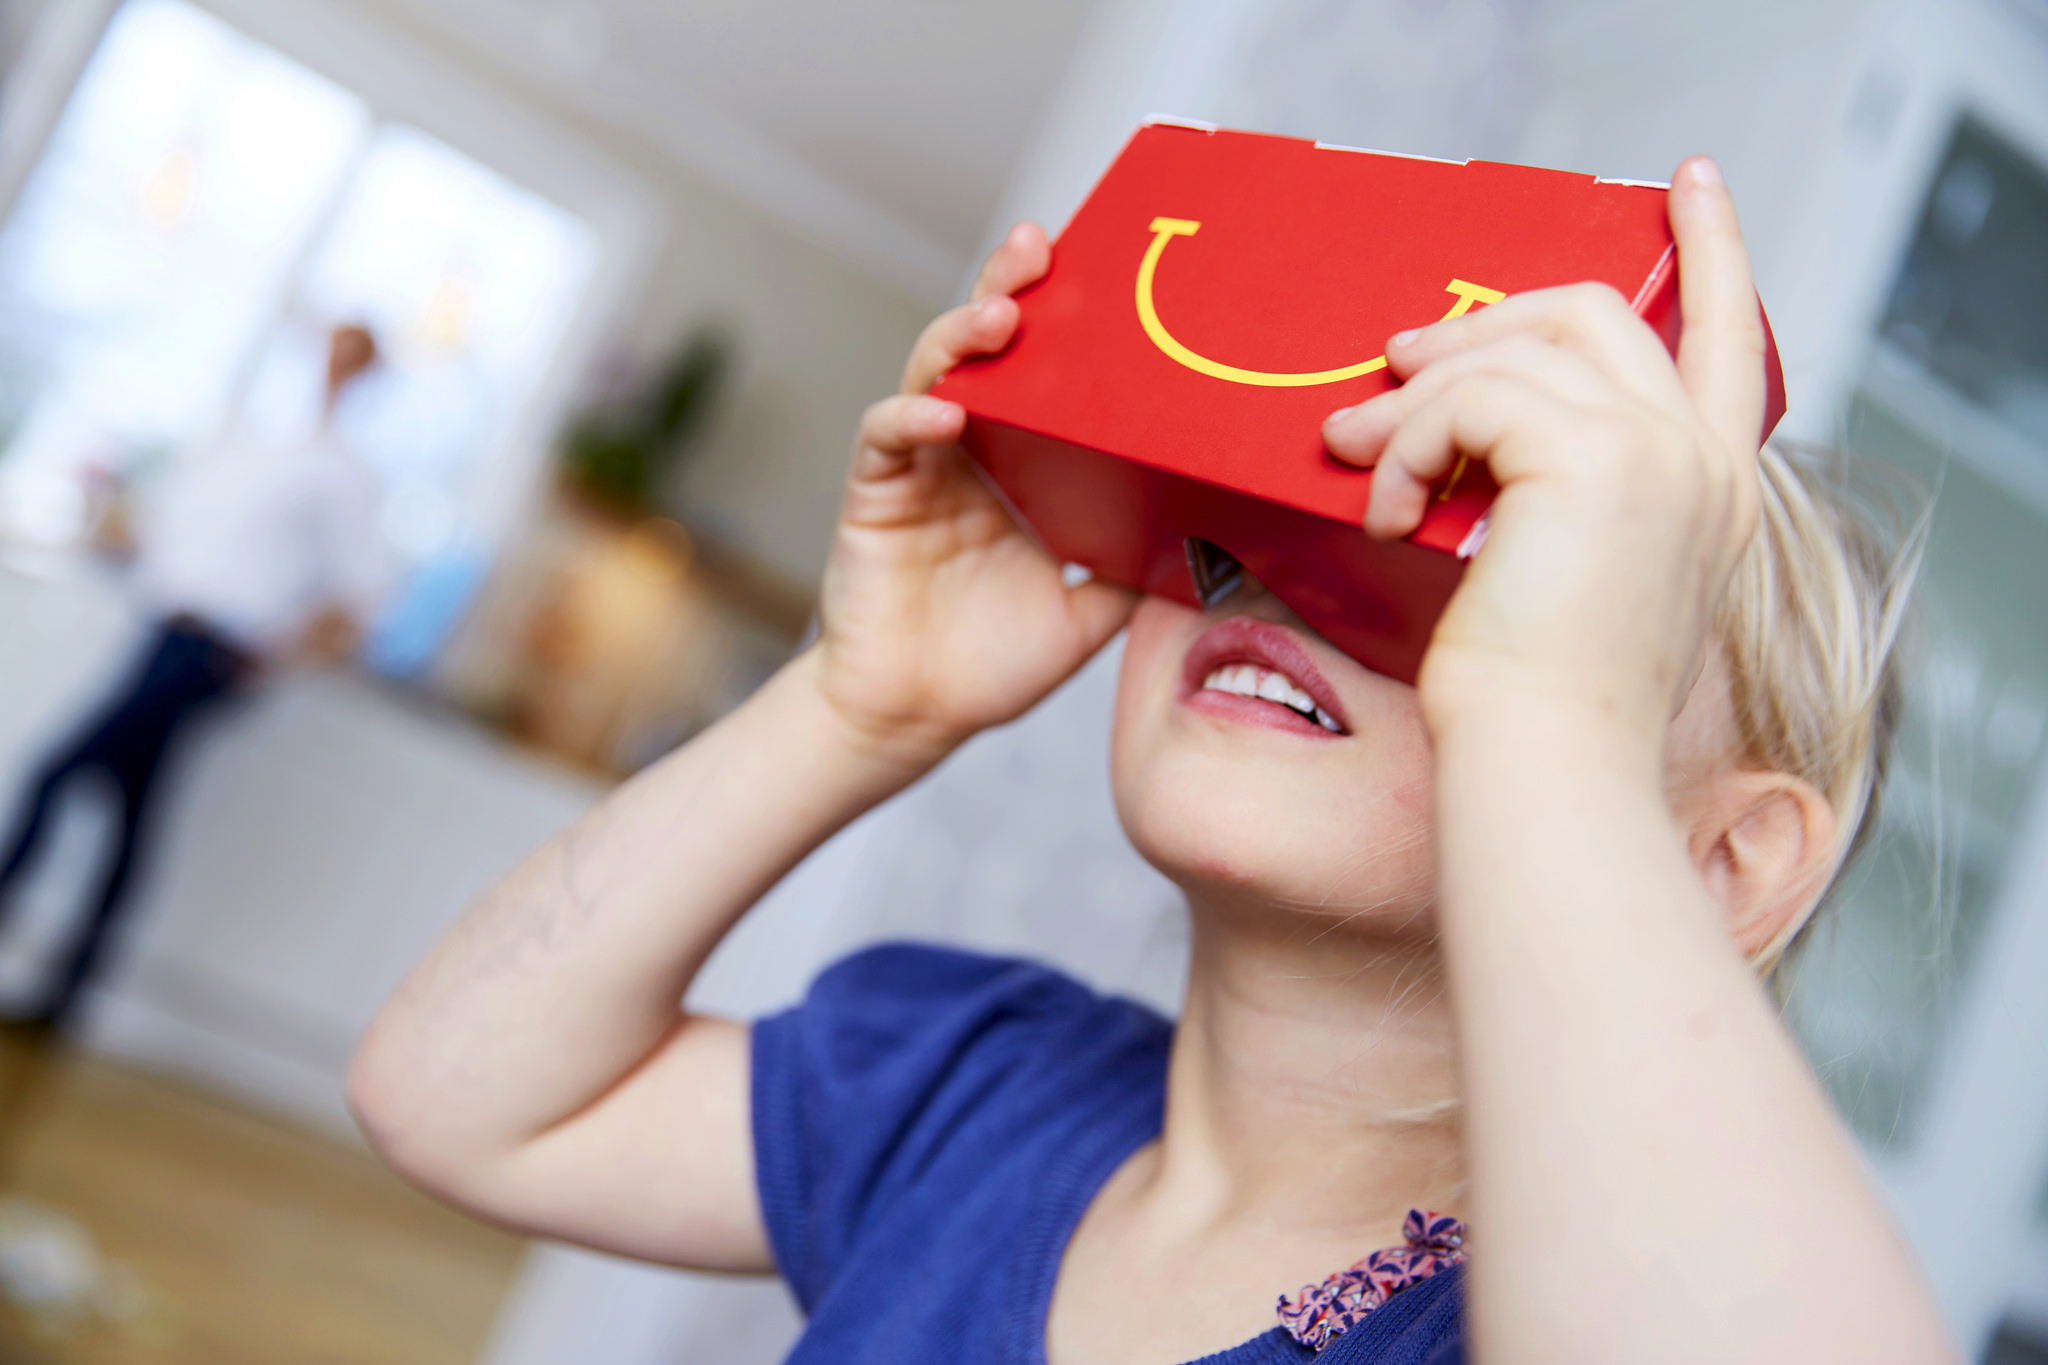 McDonald's Cardboard